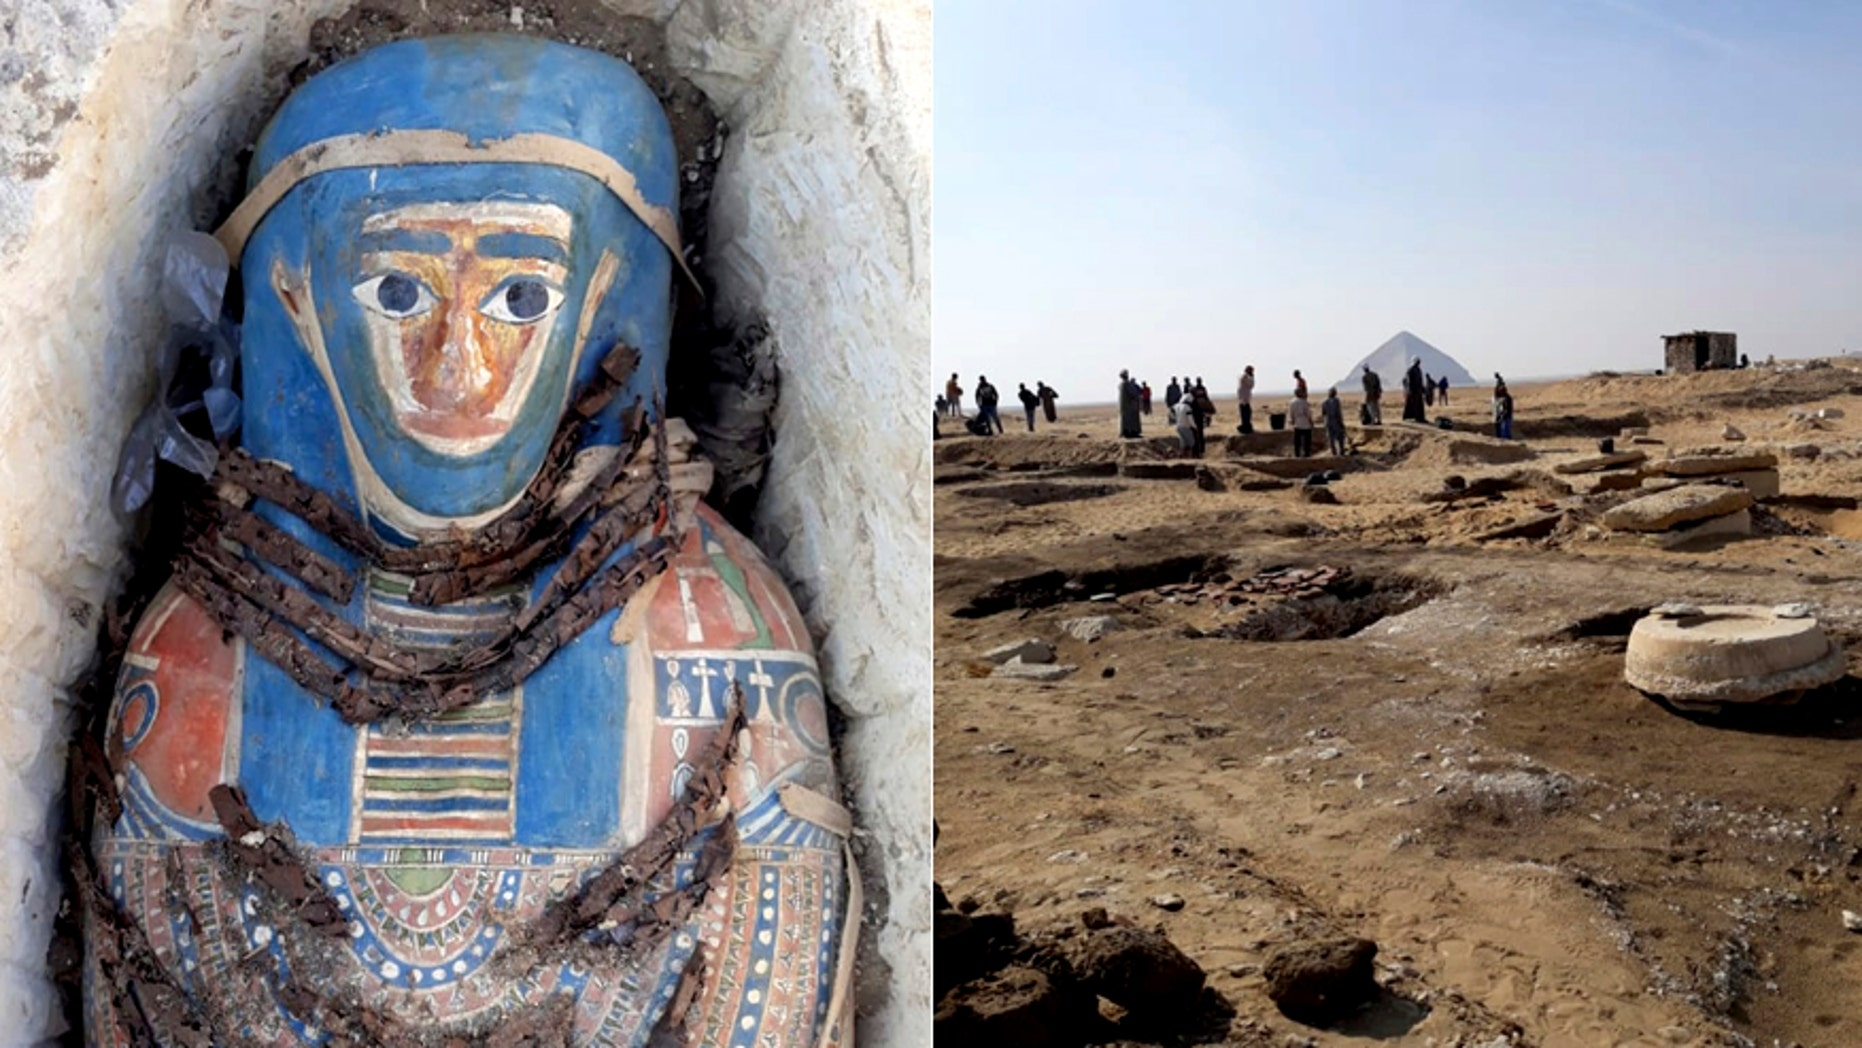 Ägypten dating sites free